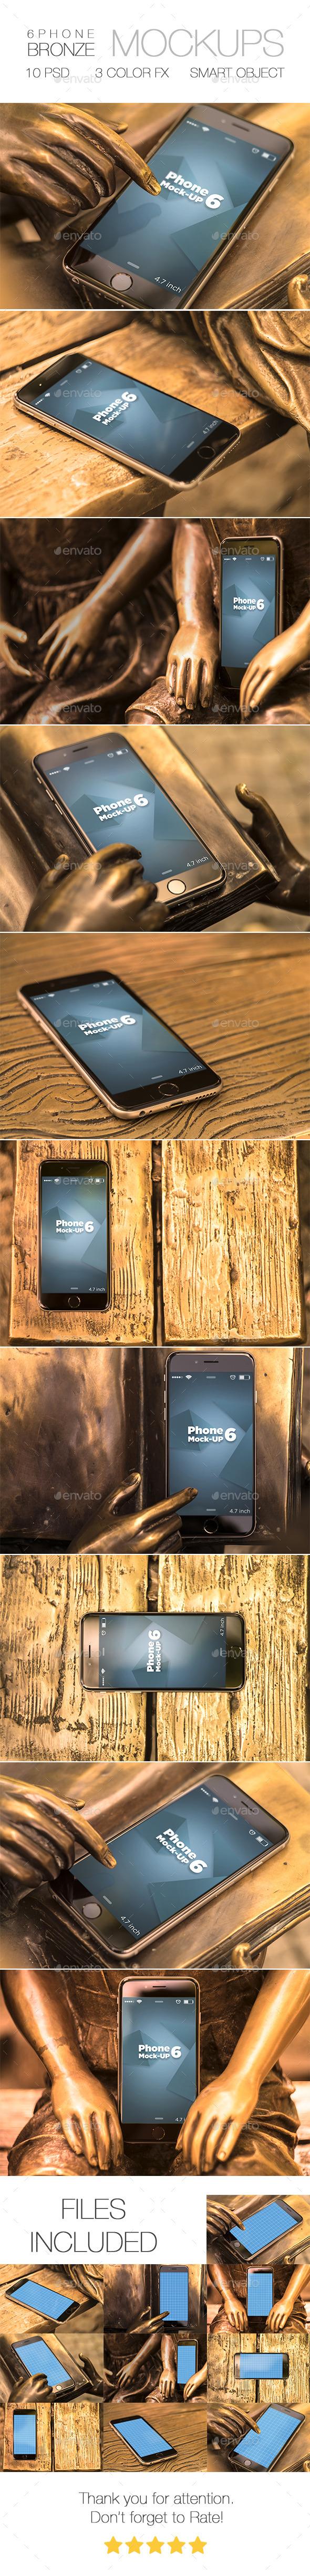 Bronze 6 Phone - Mobile Displays